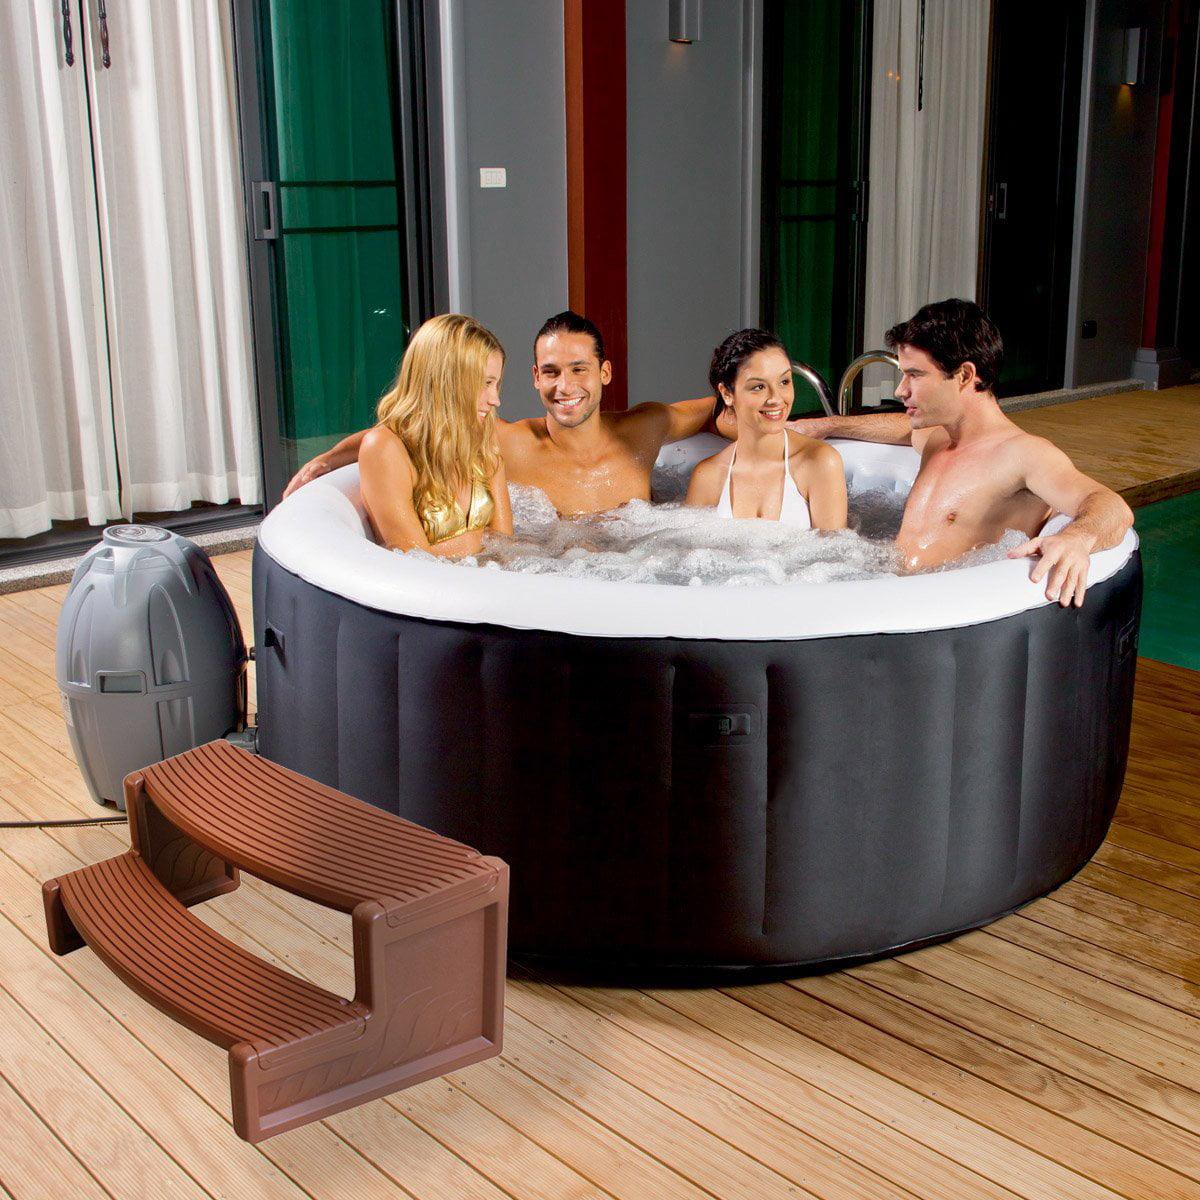 Confer Plastics HS2 Resin Multi Purpose Spa Hot Tub Handi-Step Steps, Mahogany